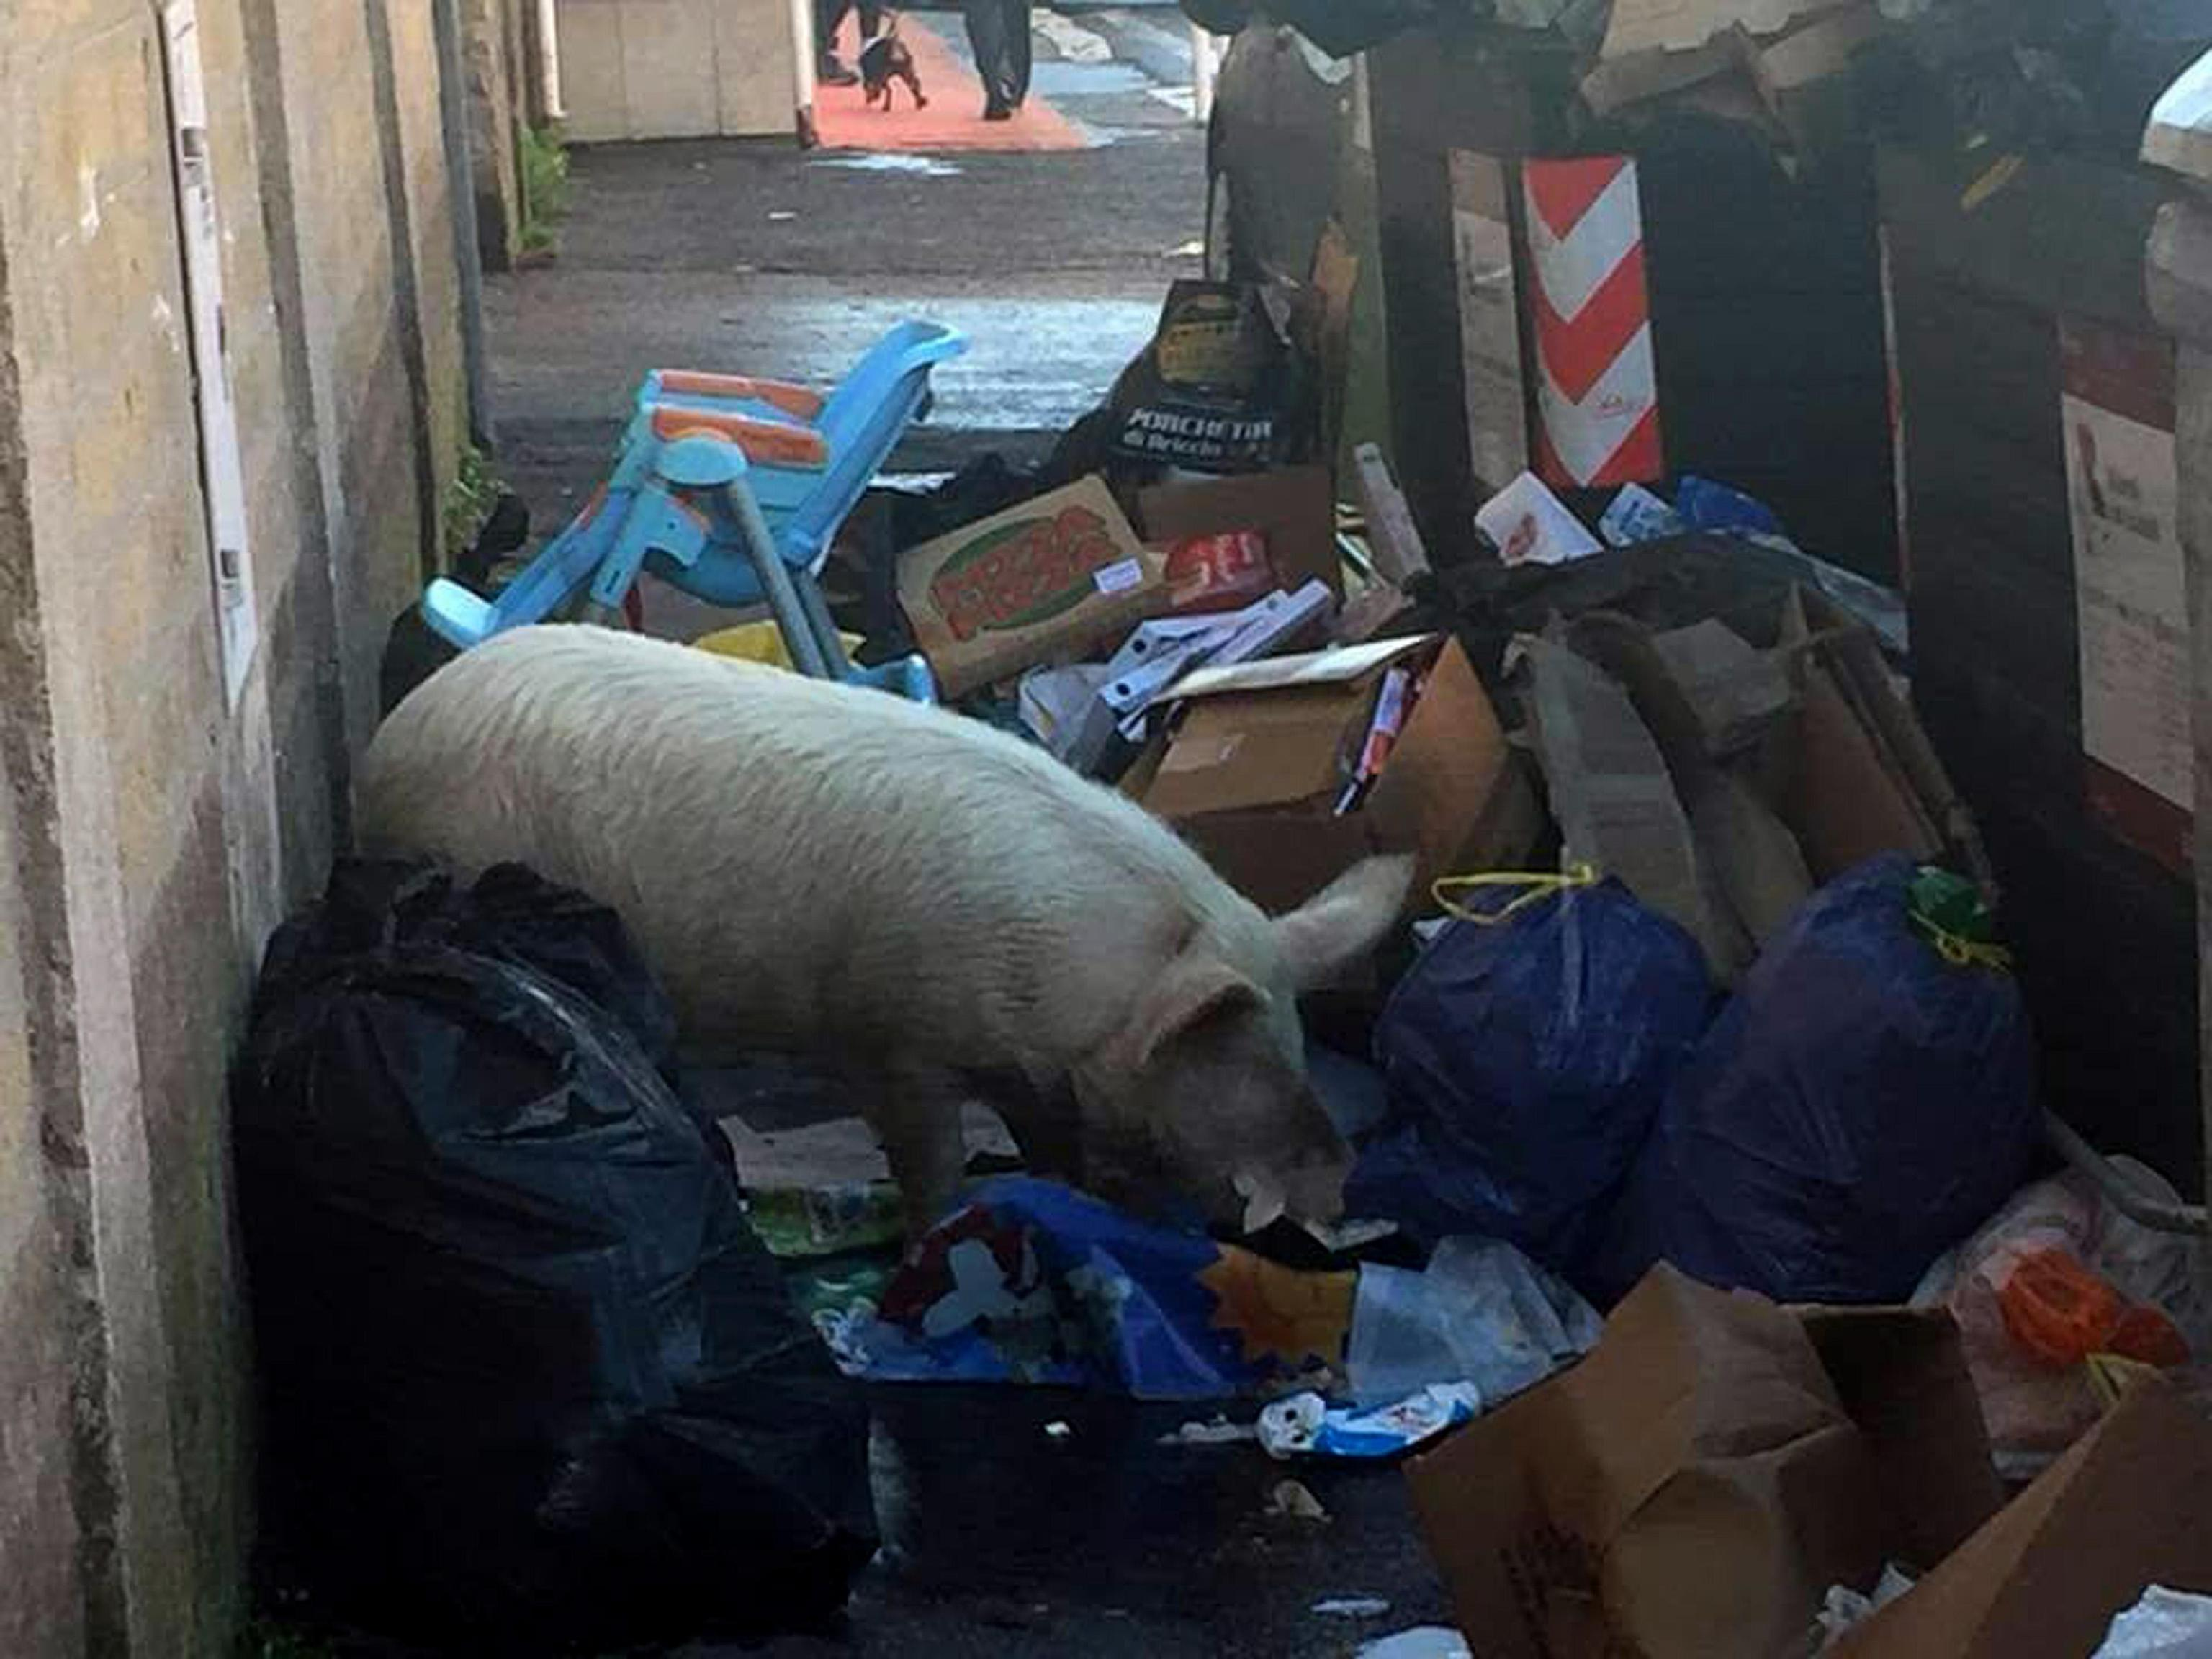 Roma: Gentiloni, serve efficienza